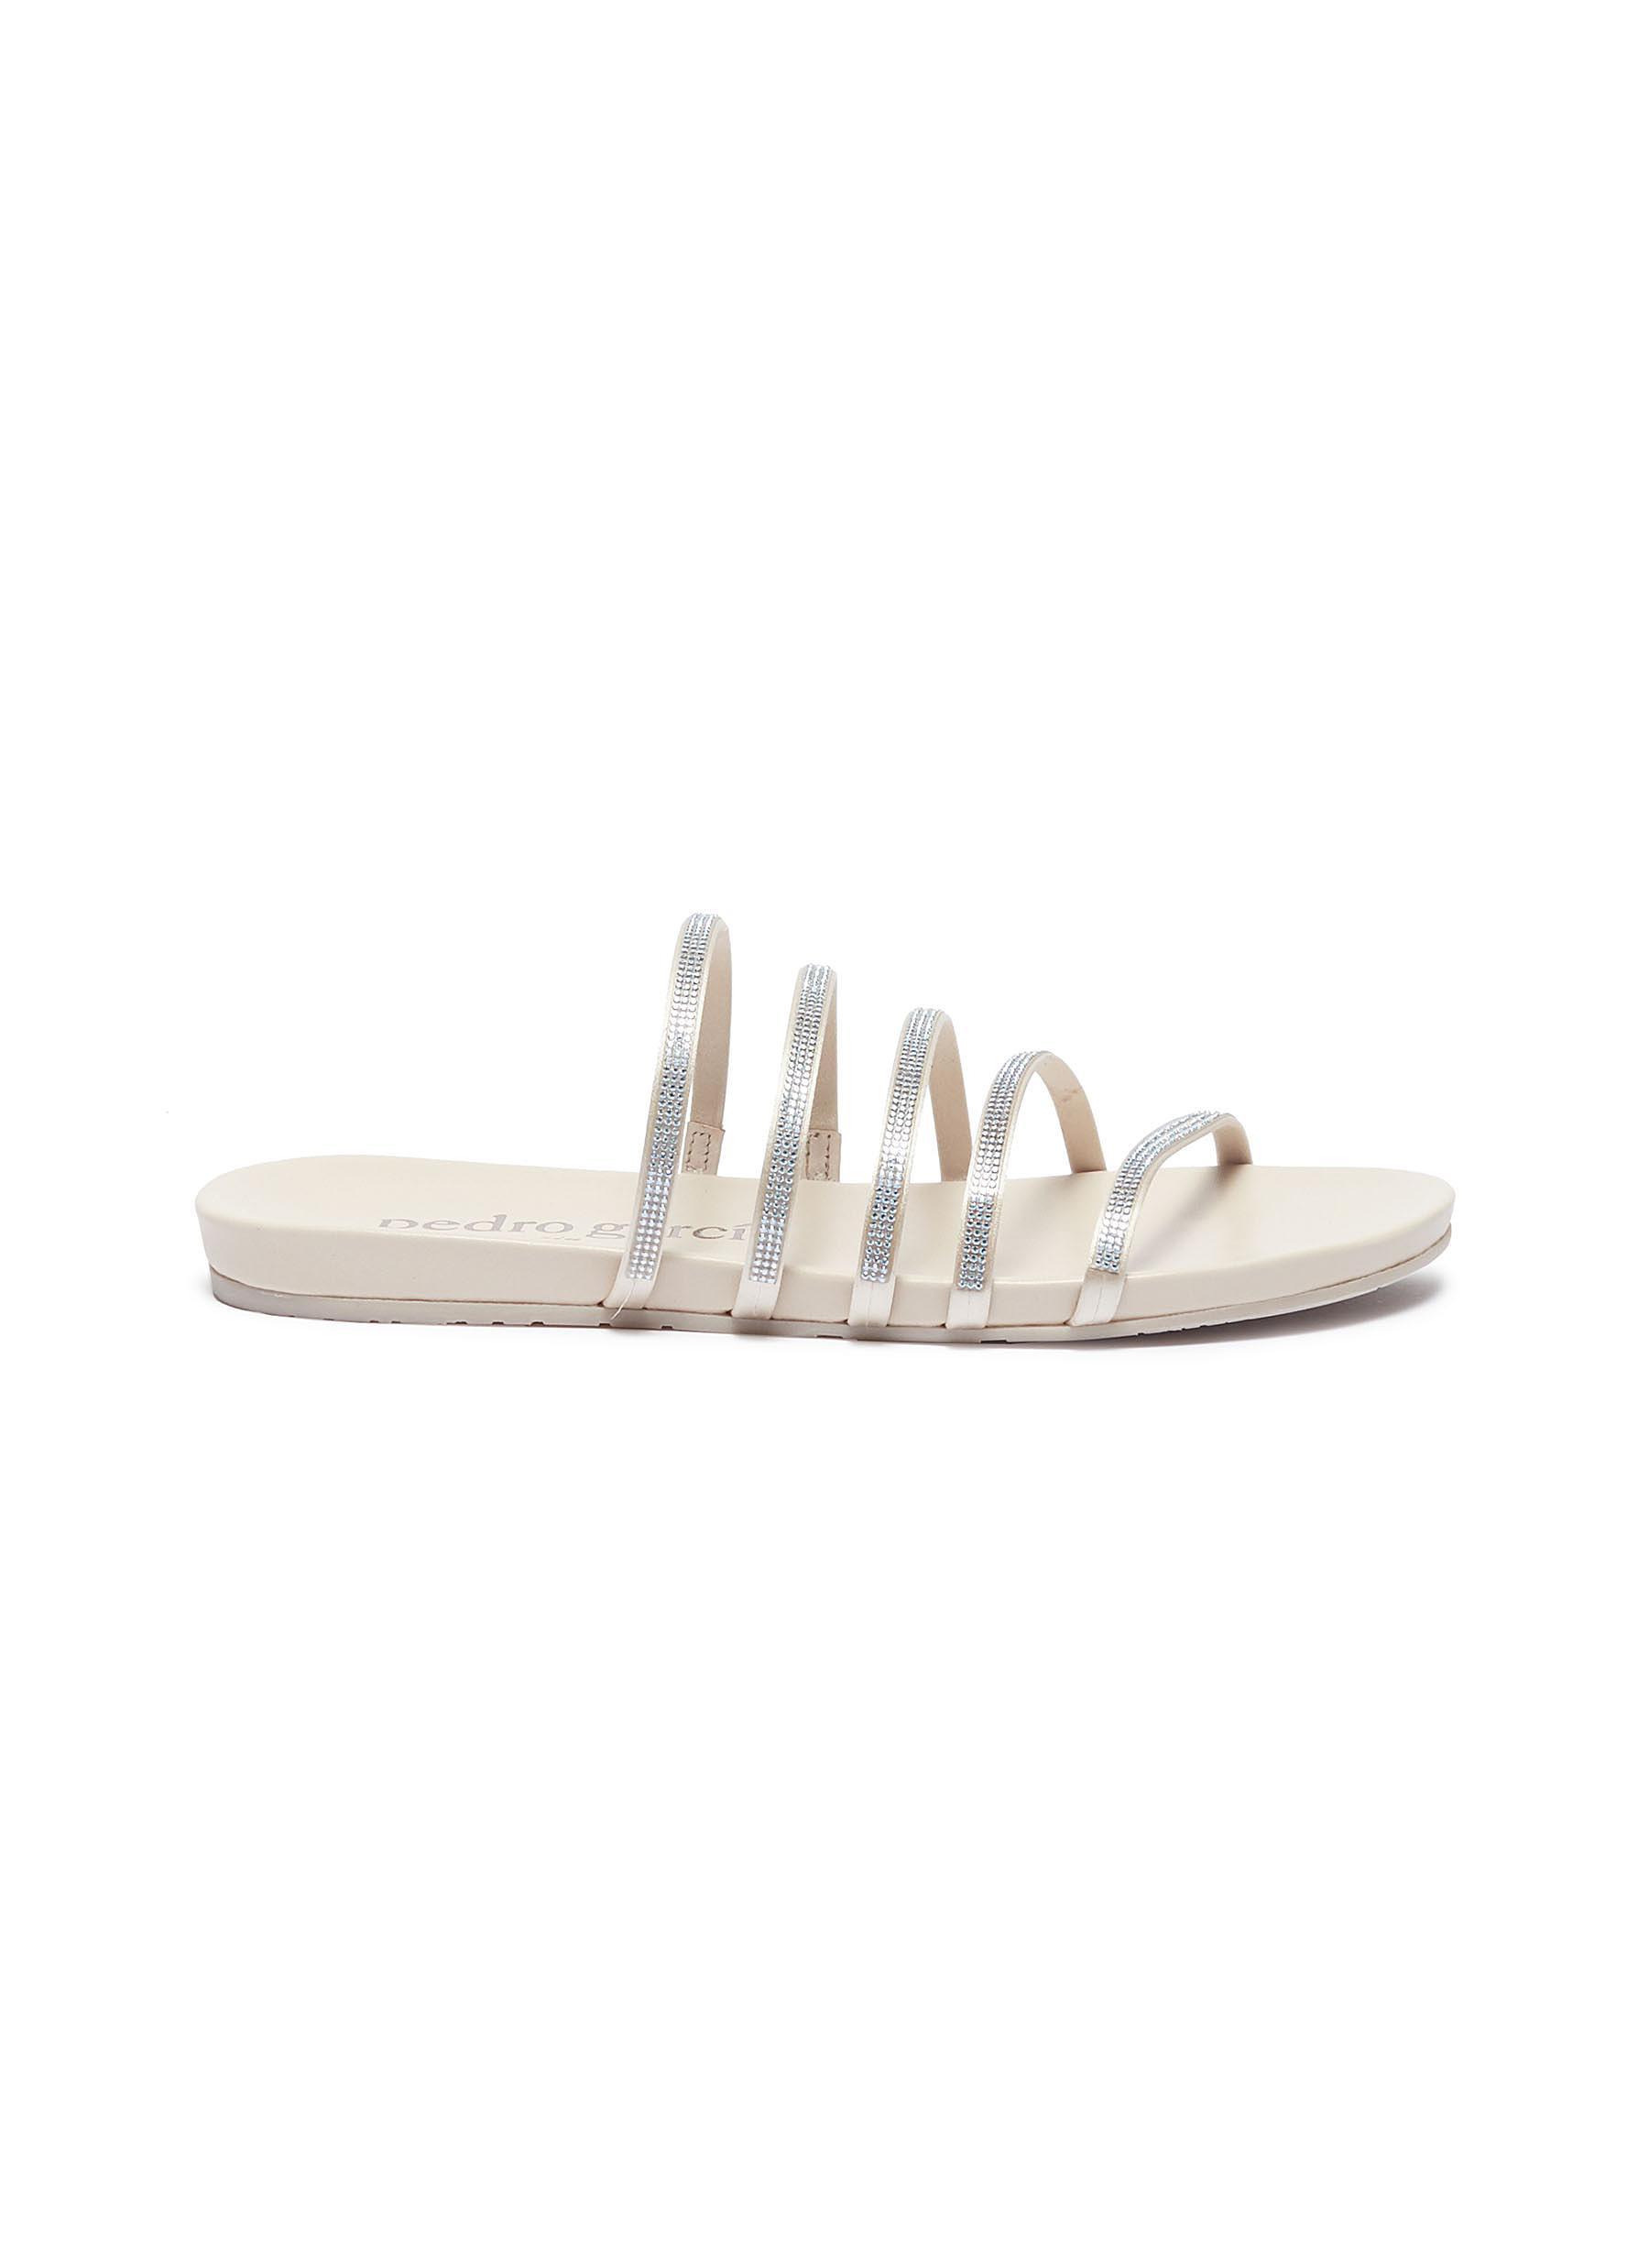 Pedro García Flats Gala Swarovski crystal strappy satin sandals